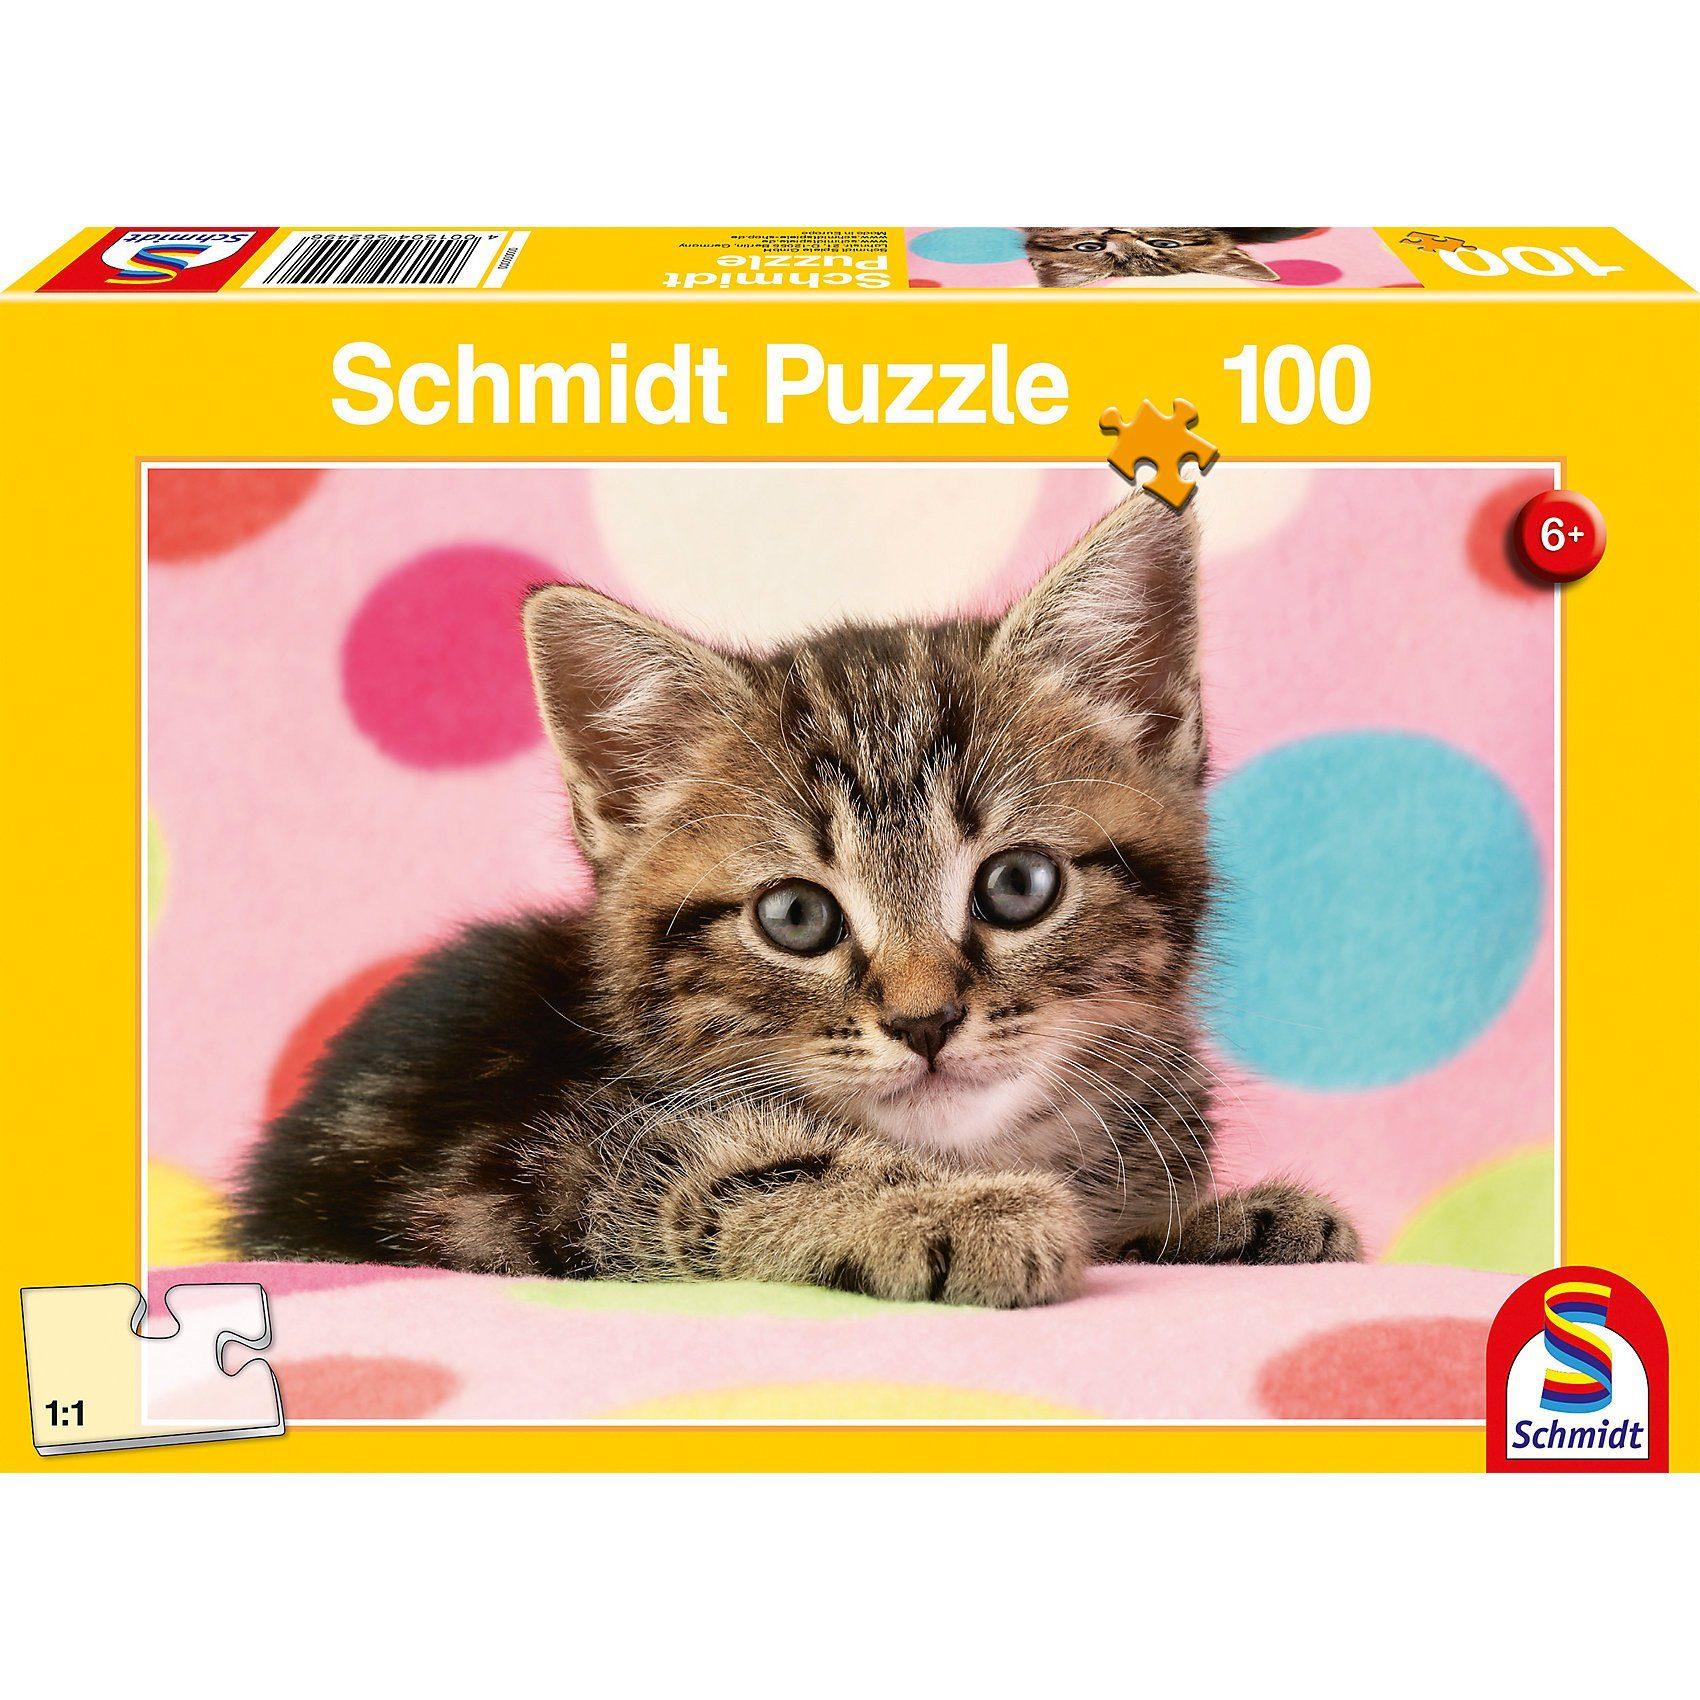 Schmidt Spiele Puzzle 100 Teile Süßes Katzenkind